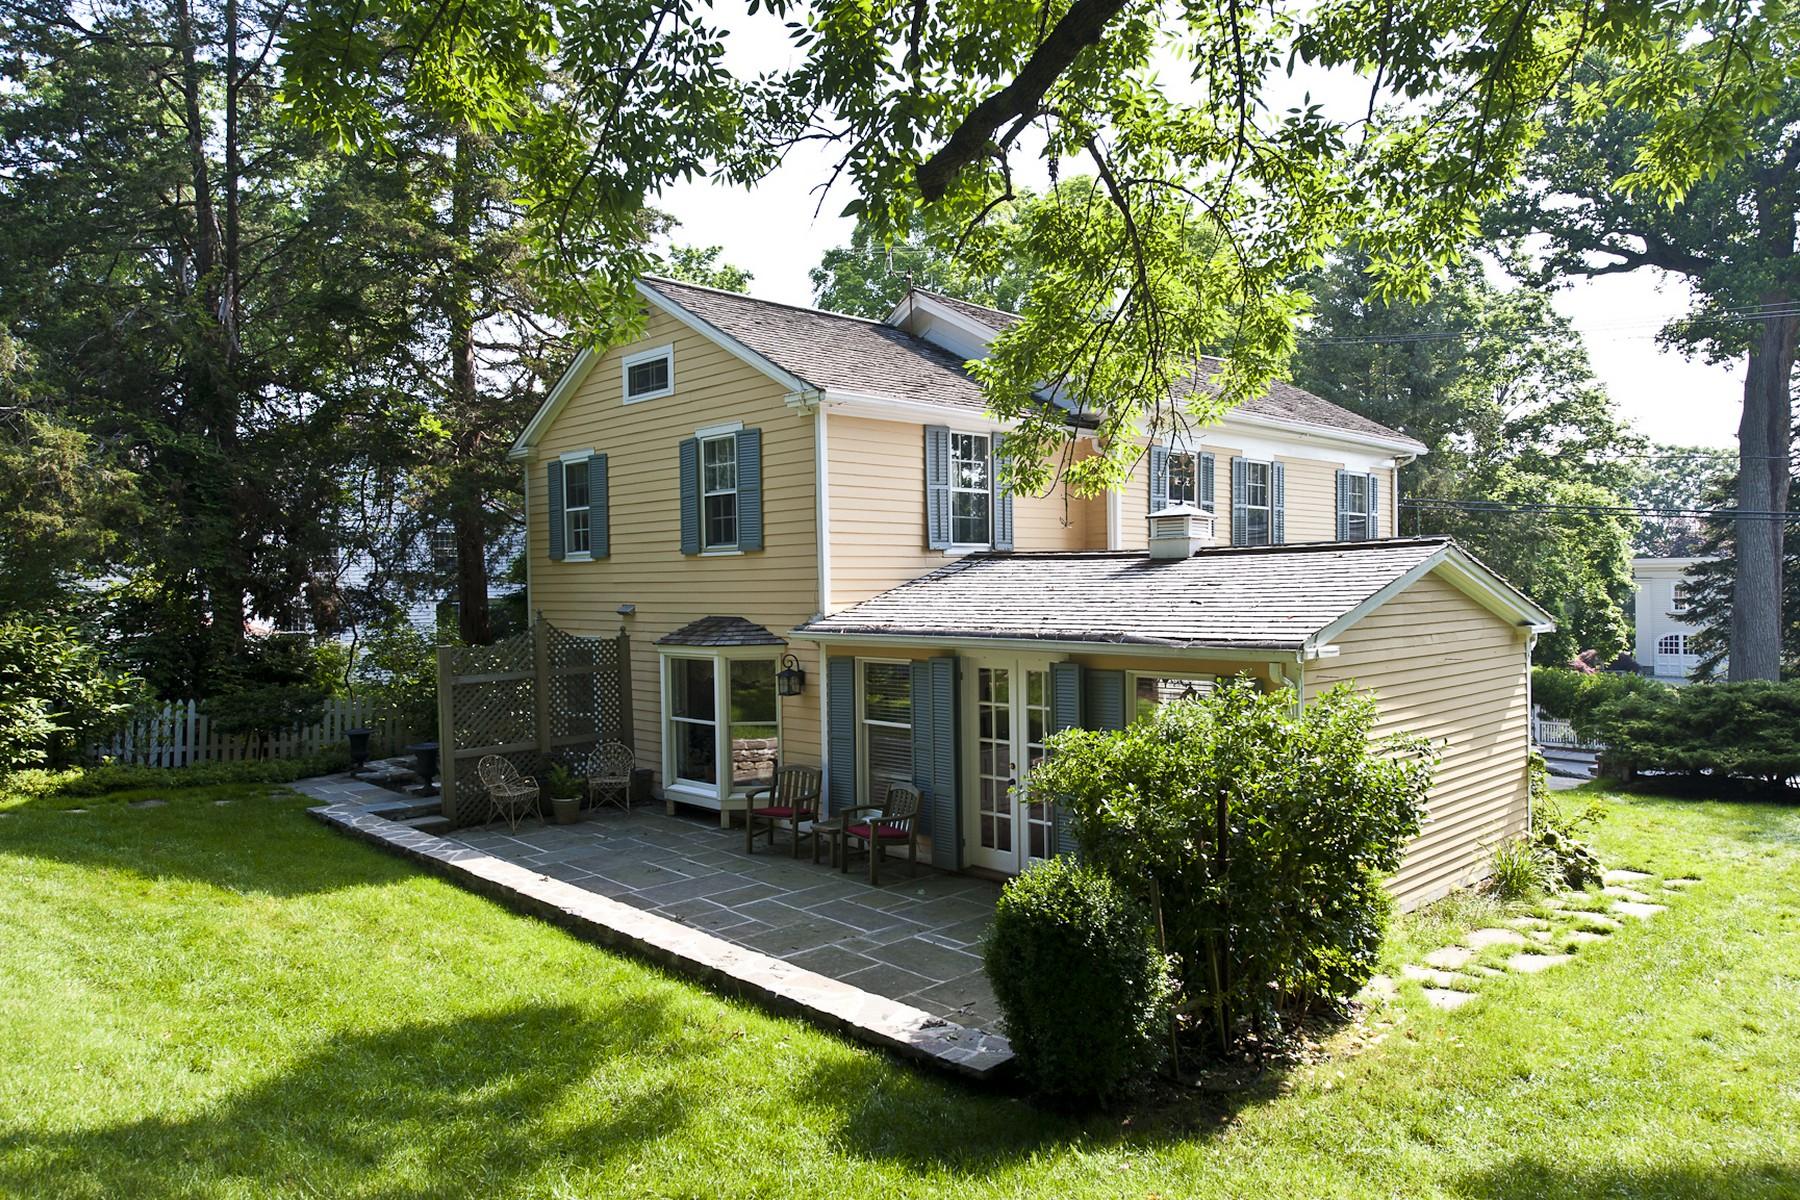 独户住宅 为 销售 在 Beautifully Renovated c.1867 Village Federal 22 North Main St 埃塞克斯, 康涅狄格州, 06426 美国